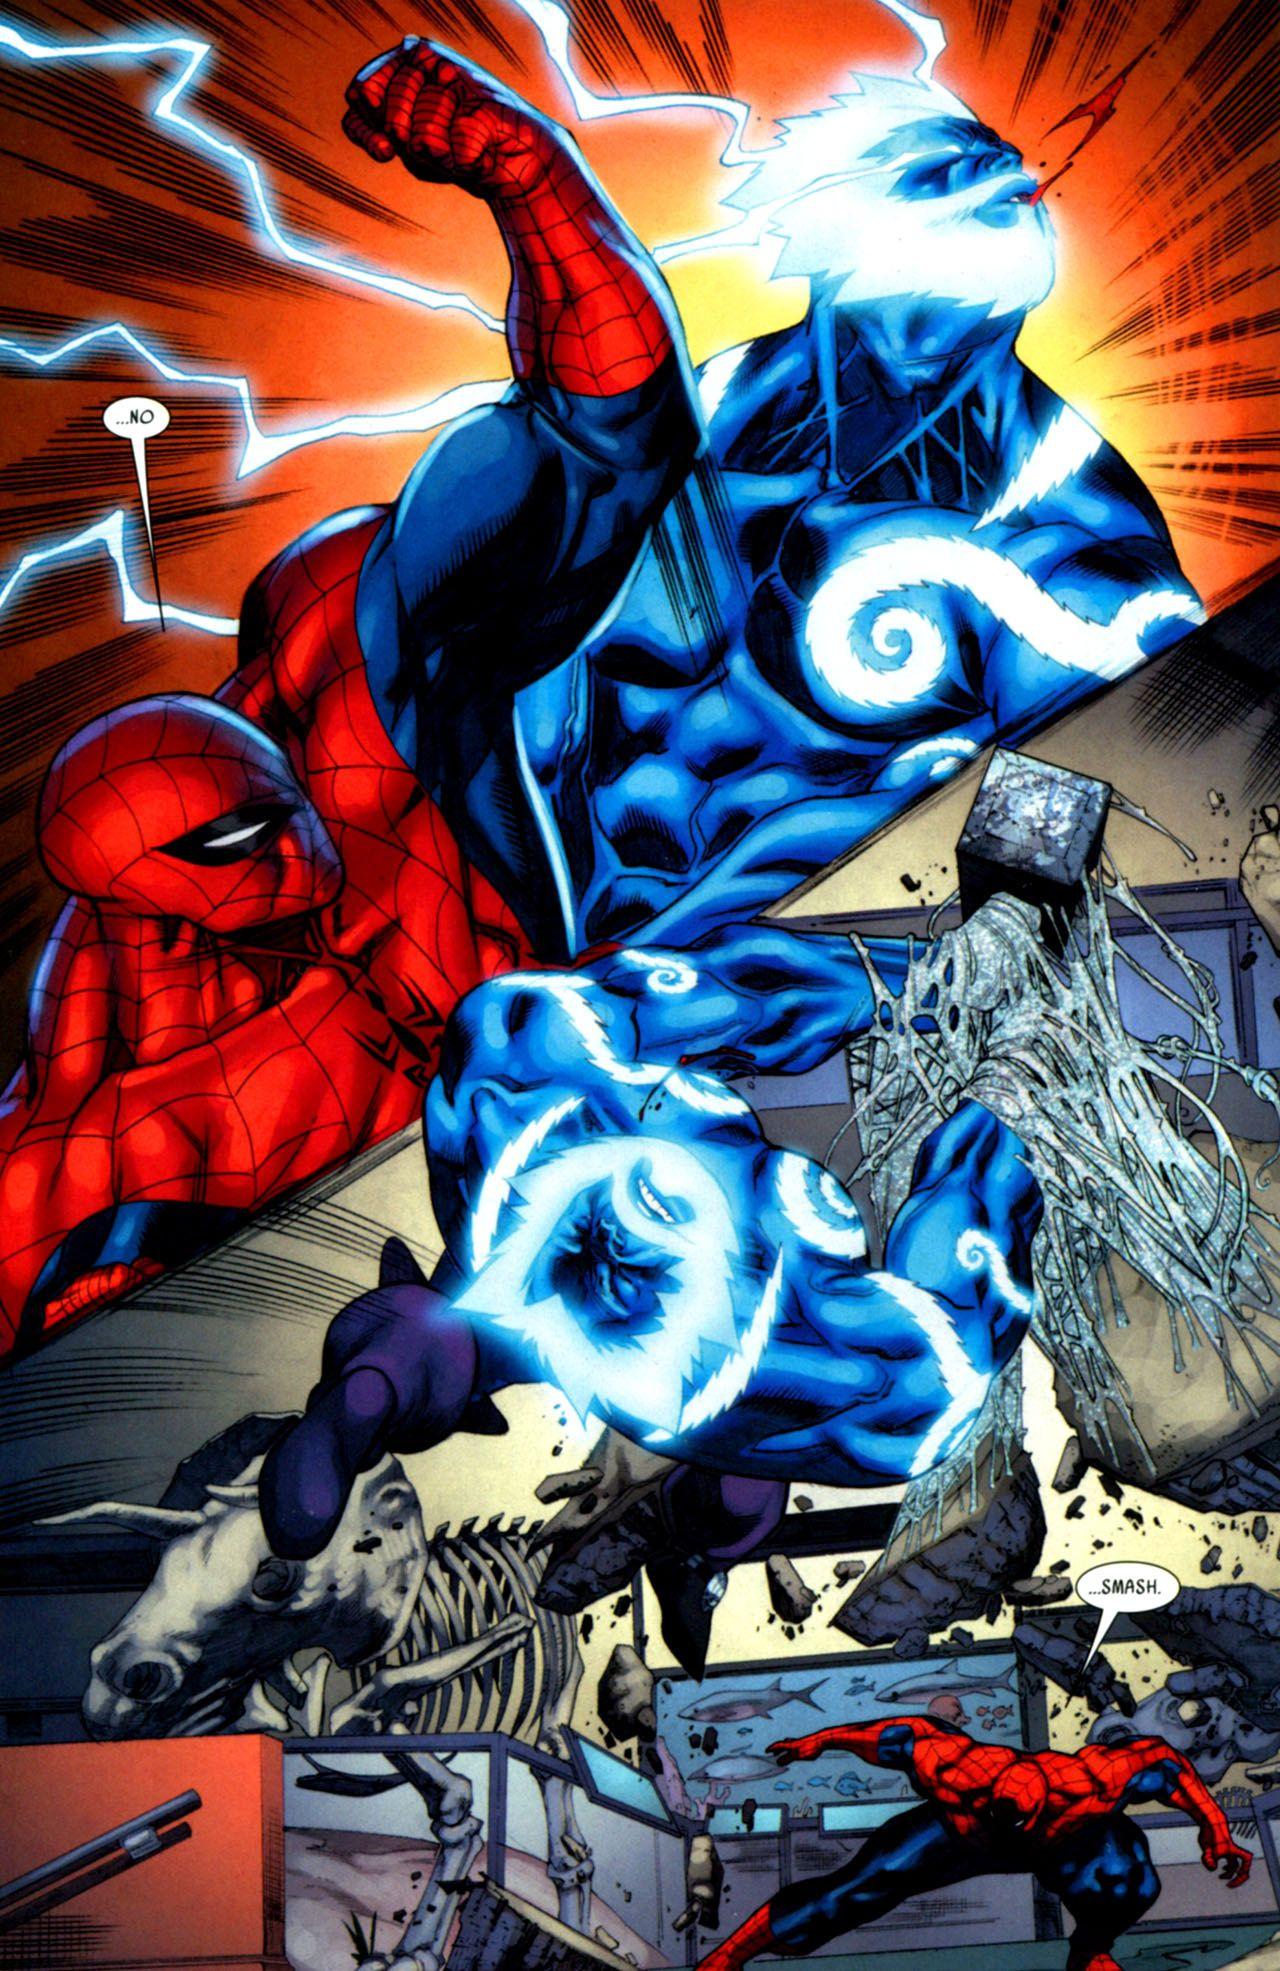 World War Hulks: Hulked Out Heroes - Spider-Hulk and Thulk ...